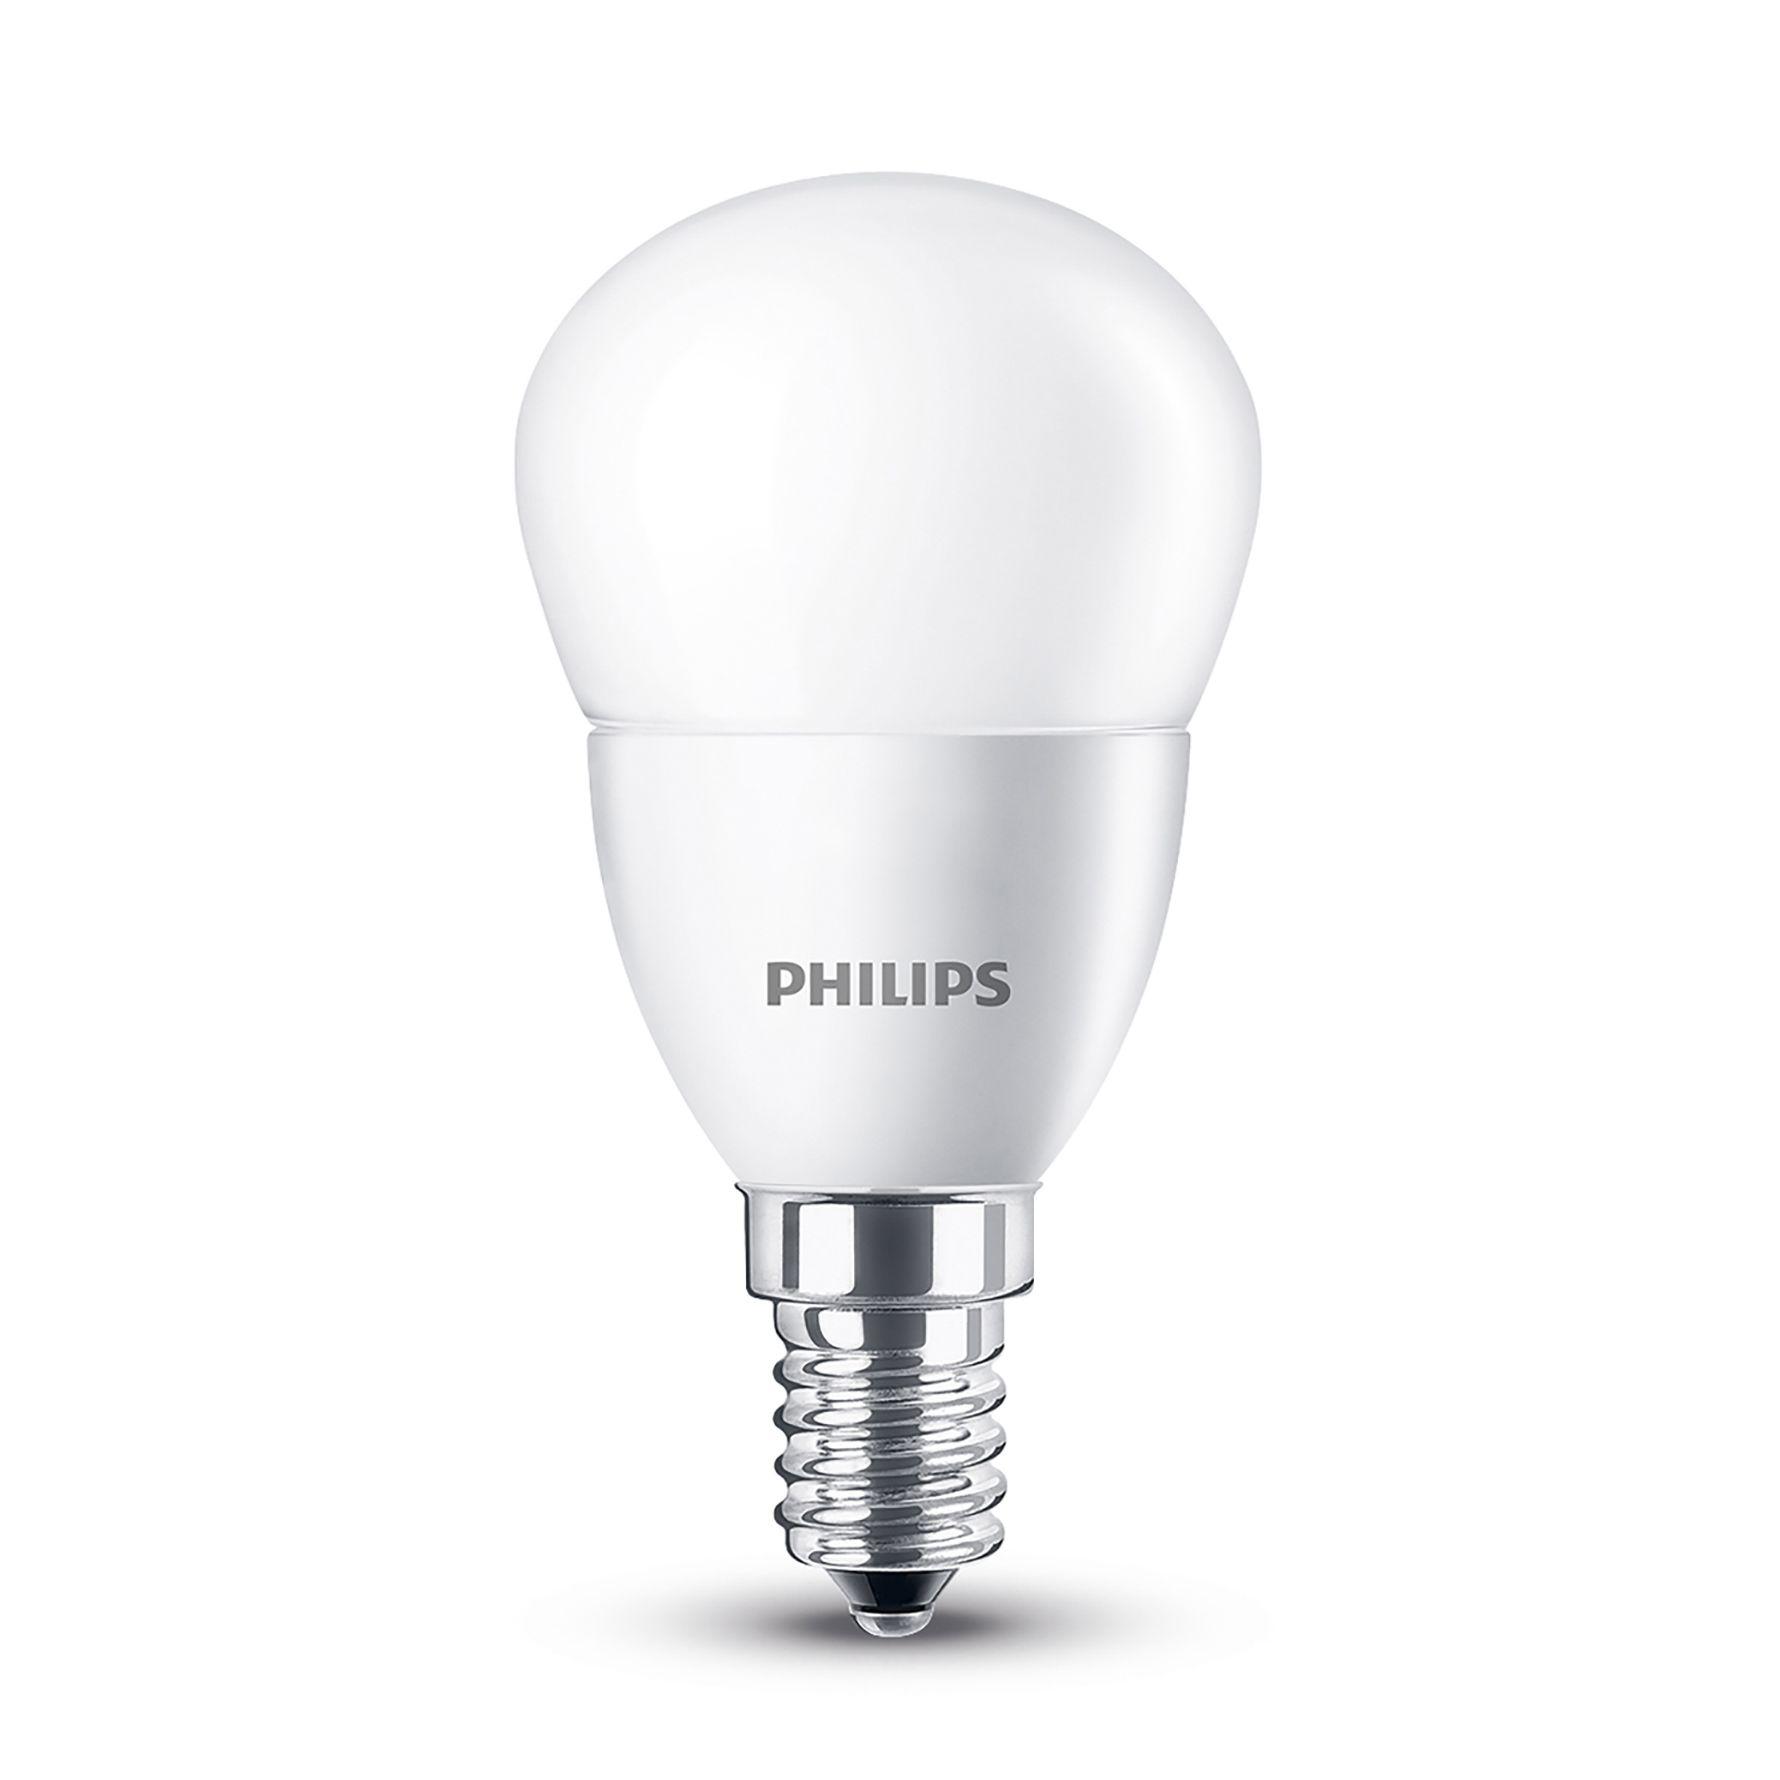 Warm White Compact Light Bulb Low Energy CFL 2700k E14 E27 Edison Screw Base Cap